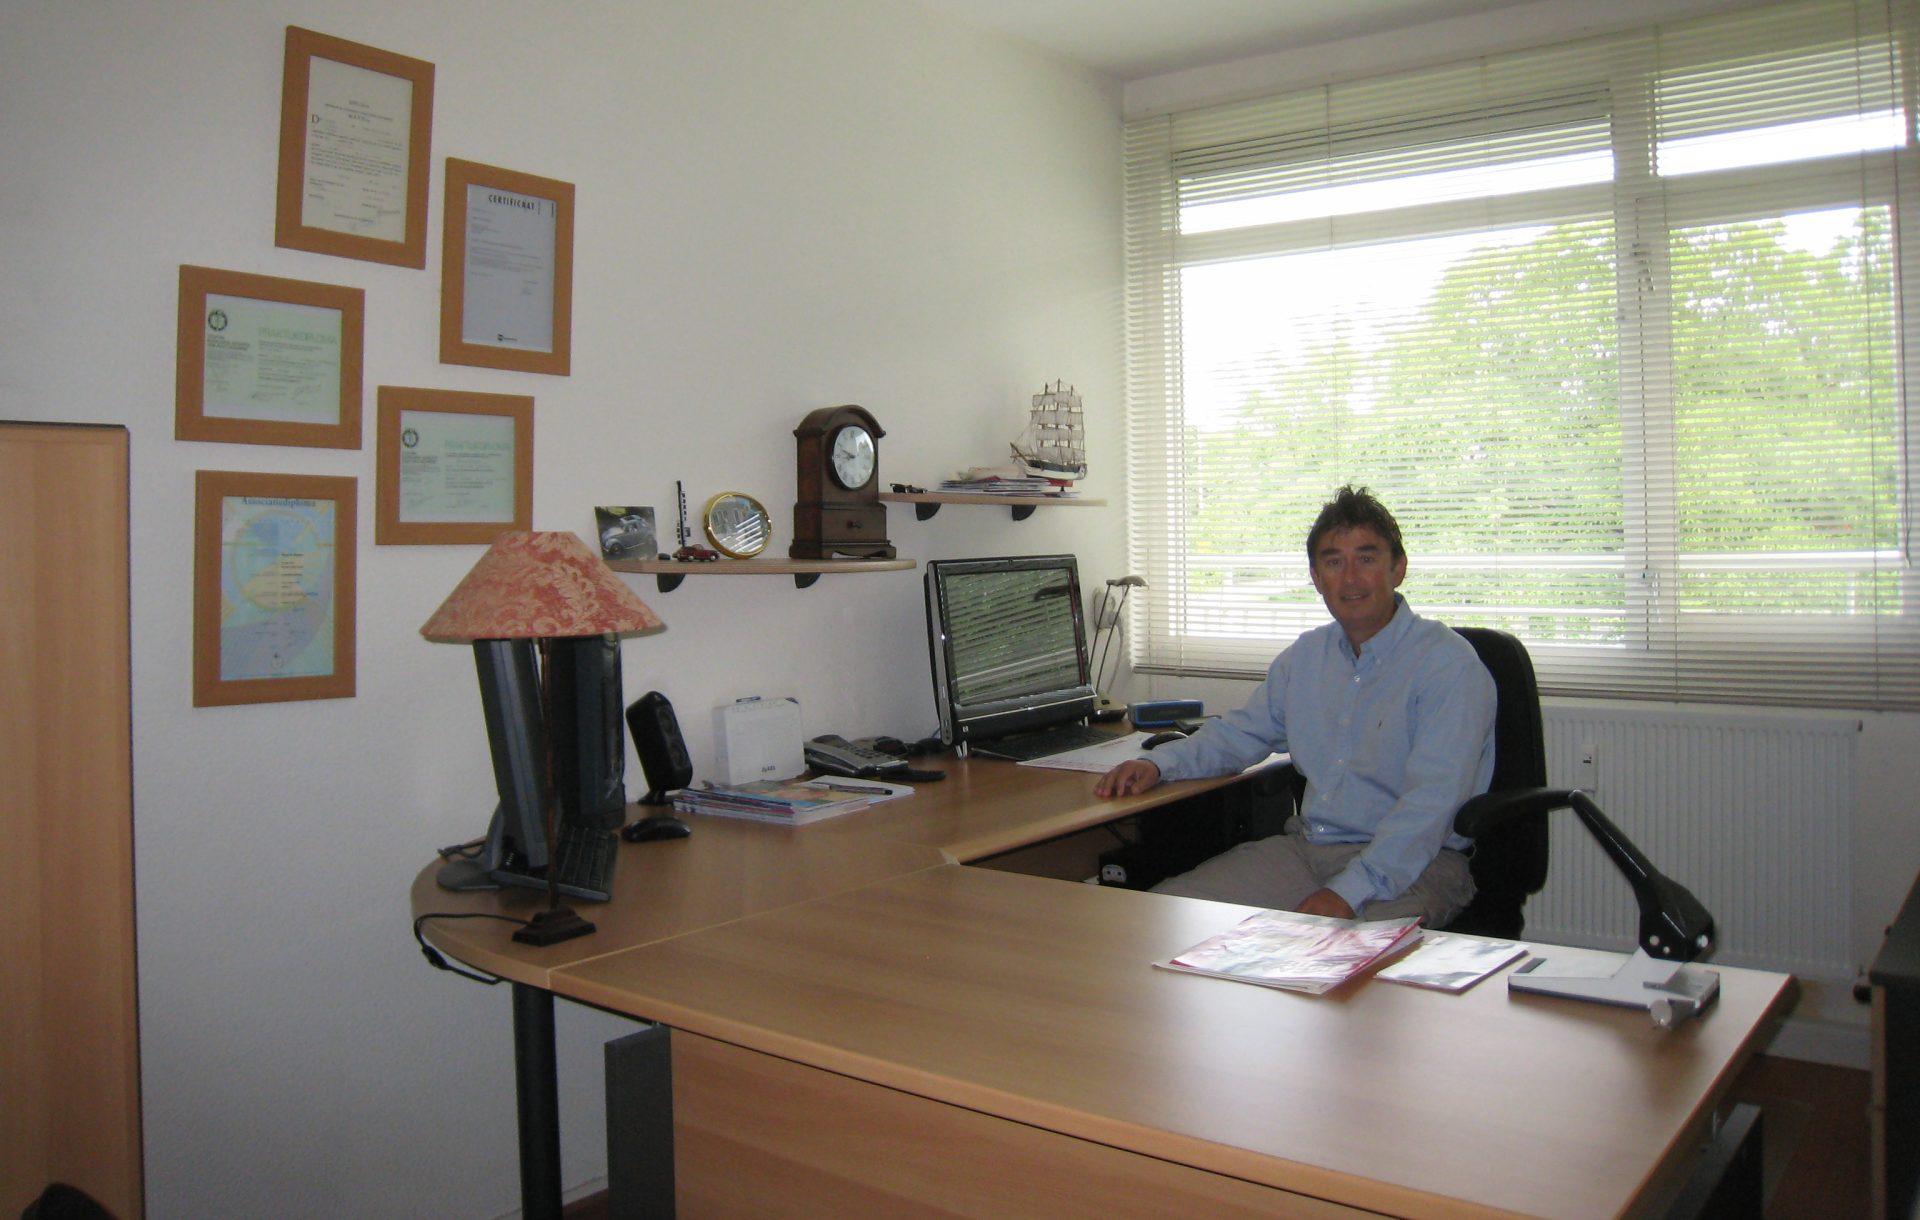 Administratiekantoor M.R. Diephuis